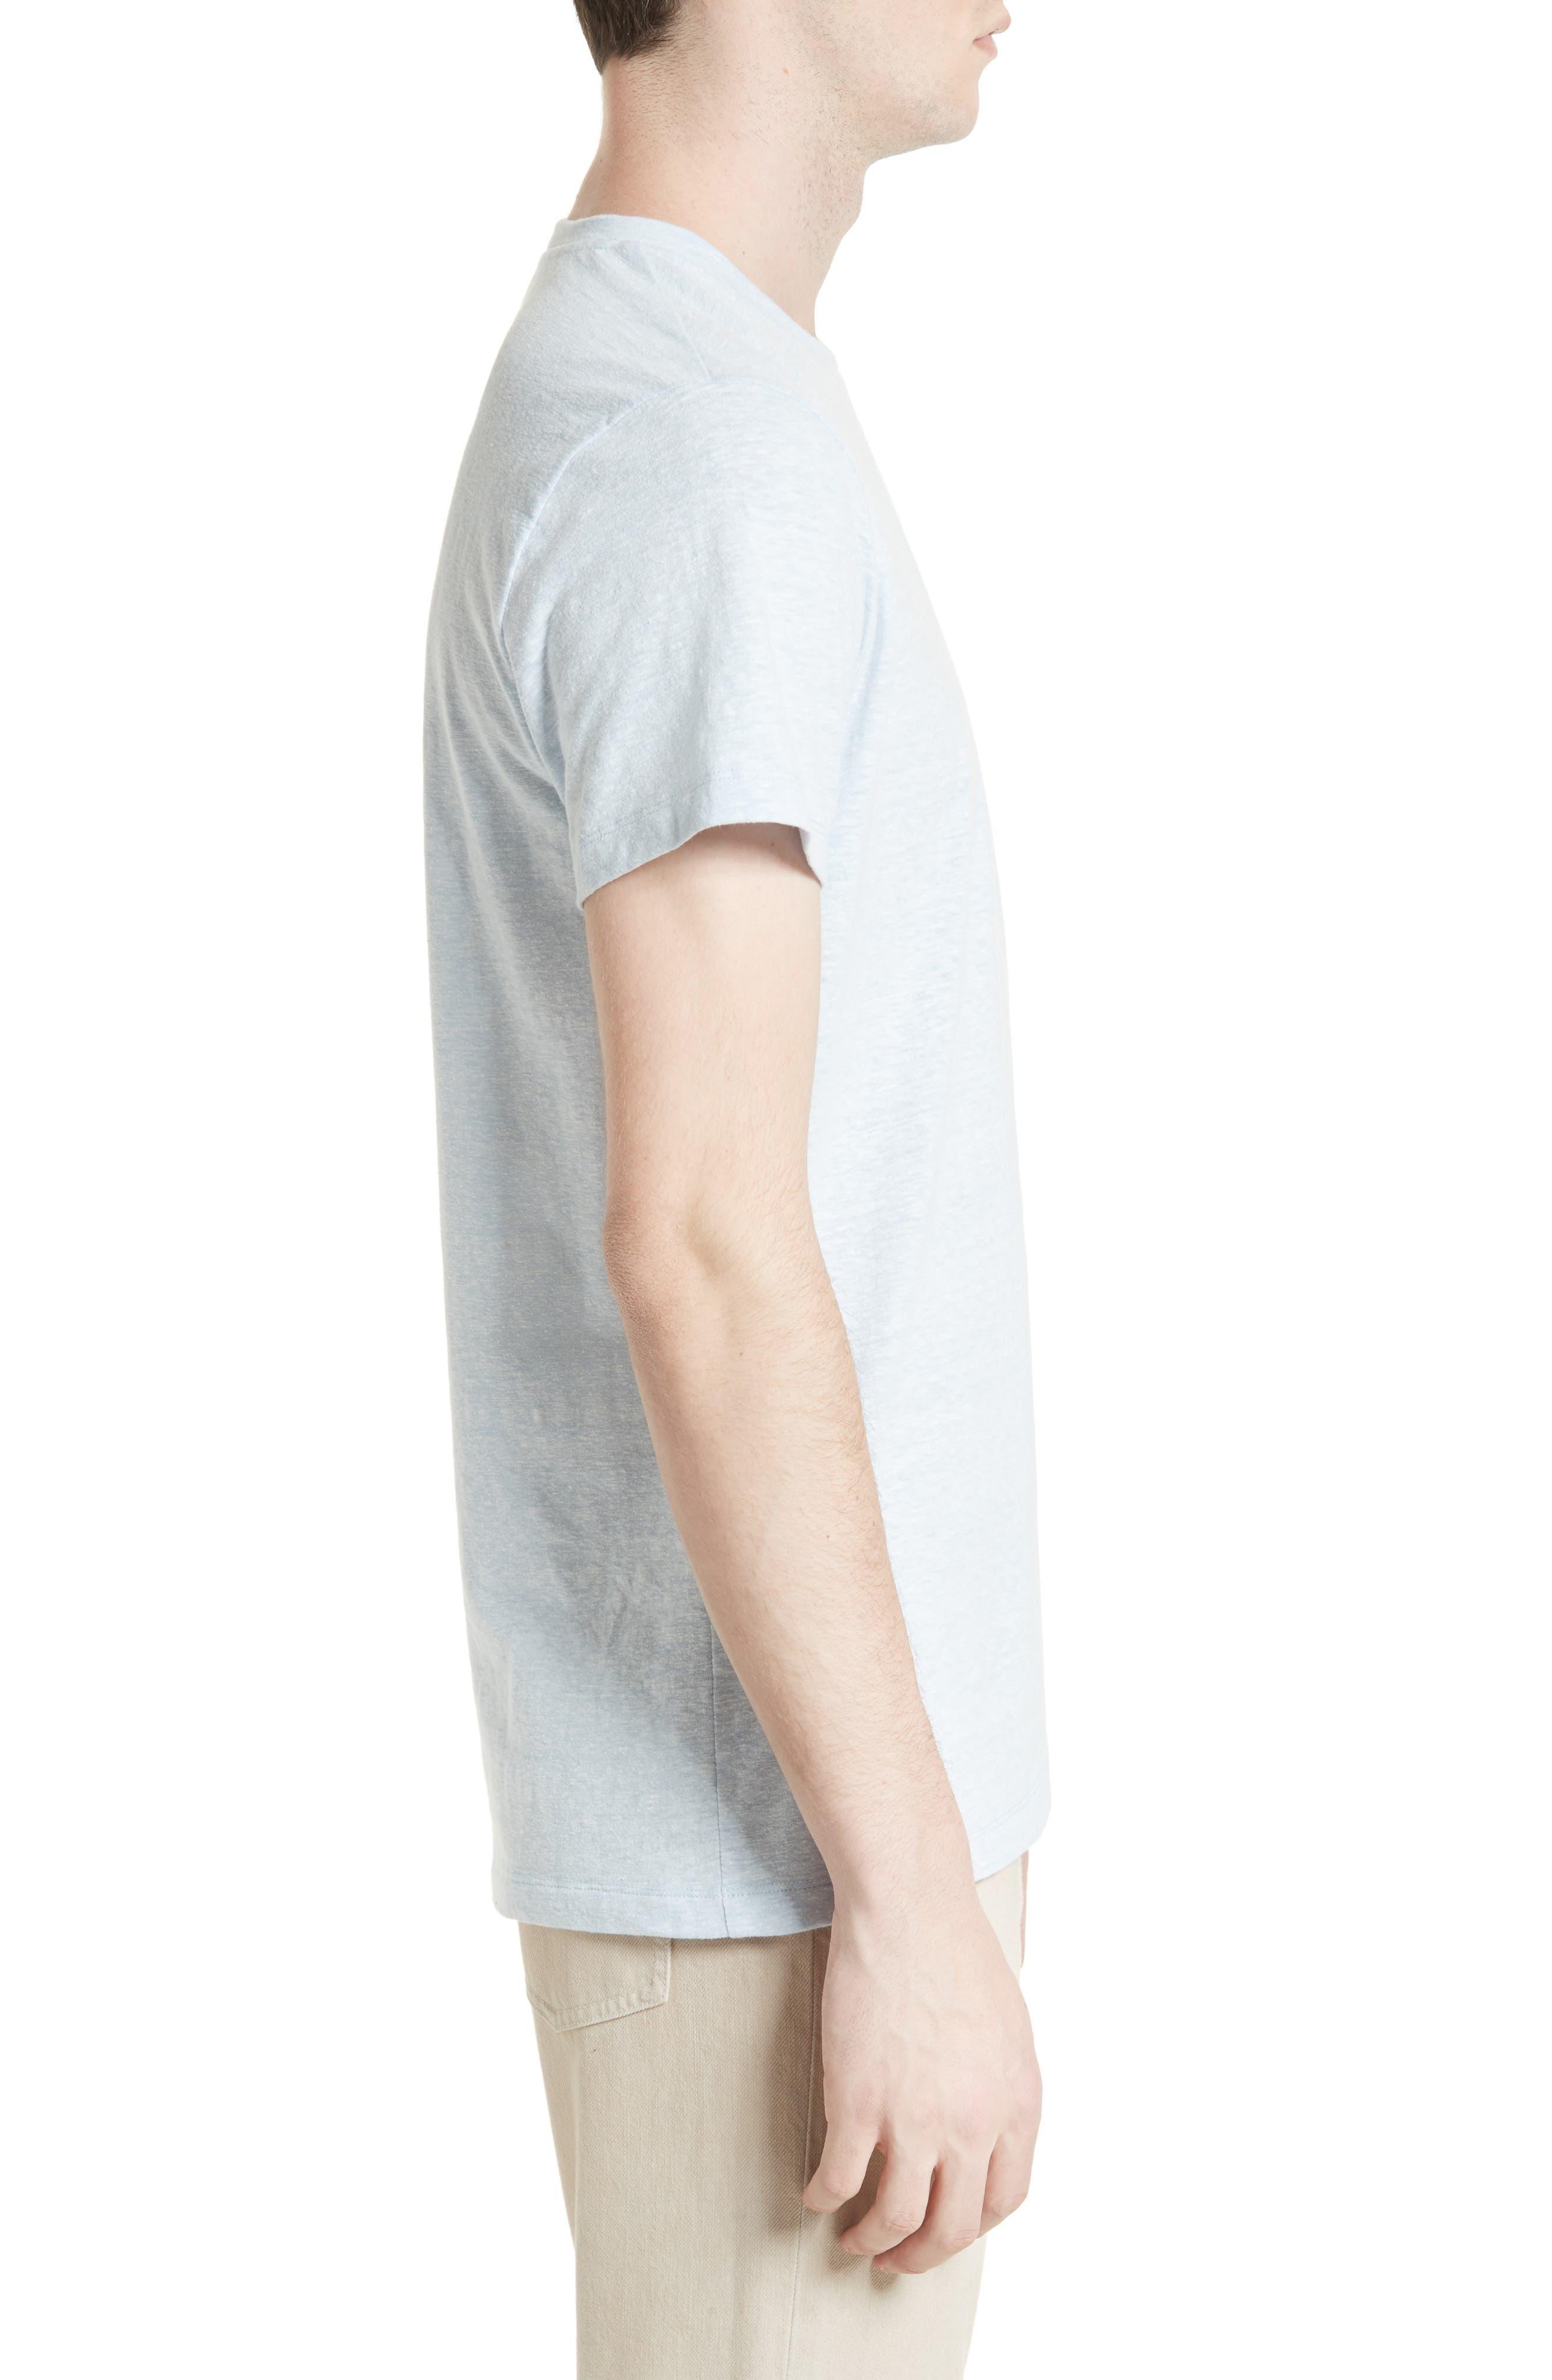 Jimmy T-Shirt,                             Alternate thumbnail 3, color,                             Blue